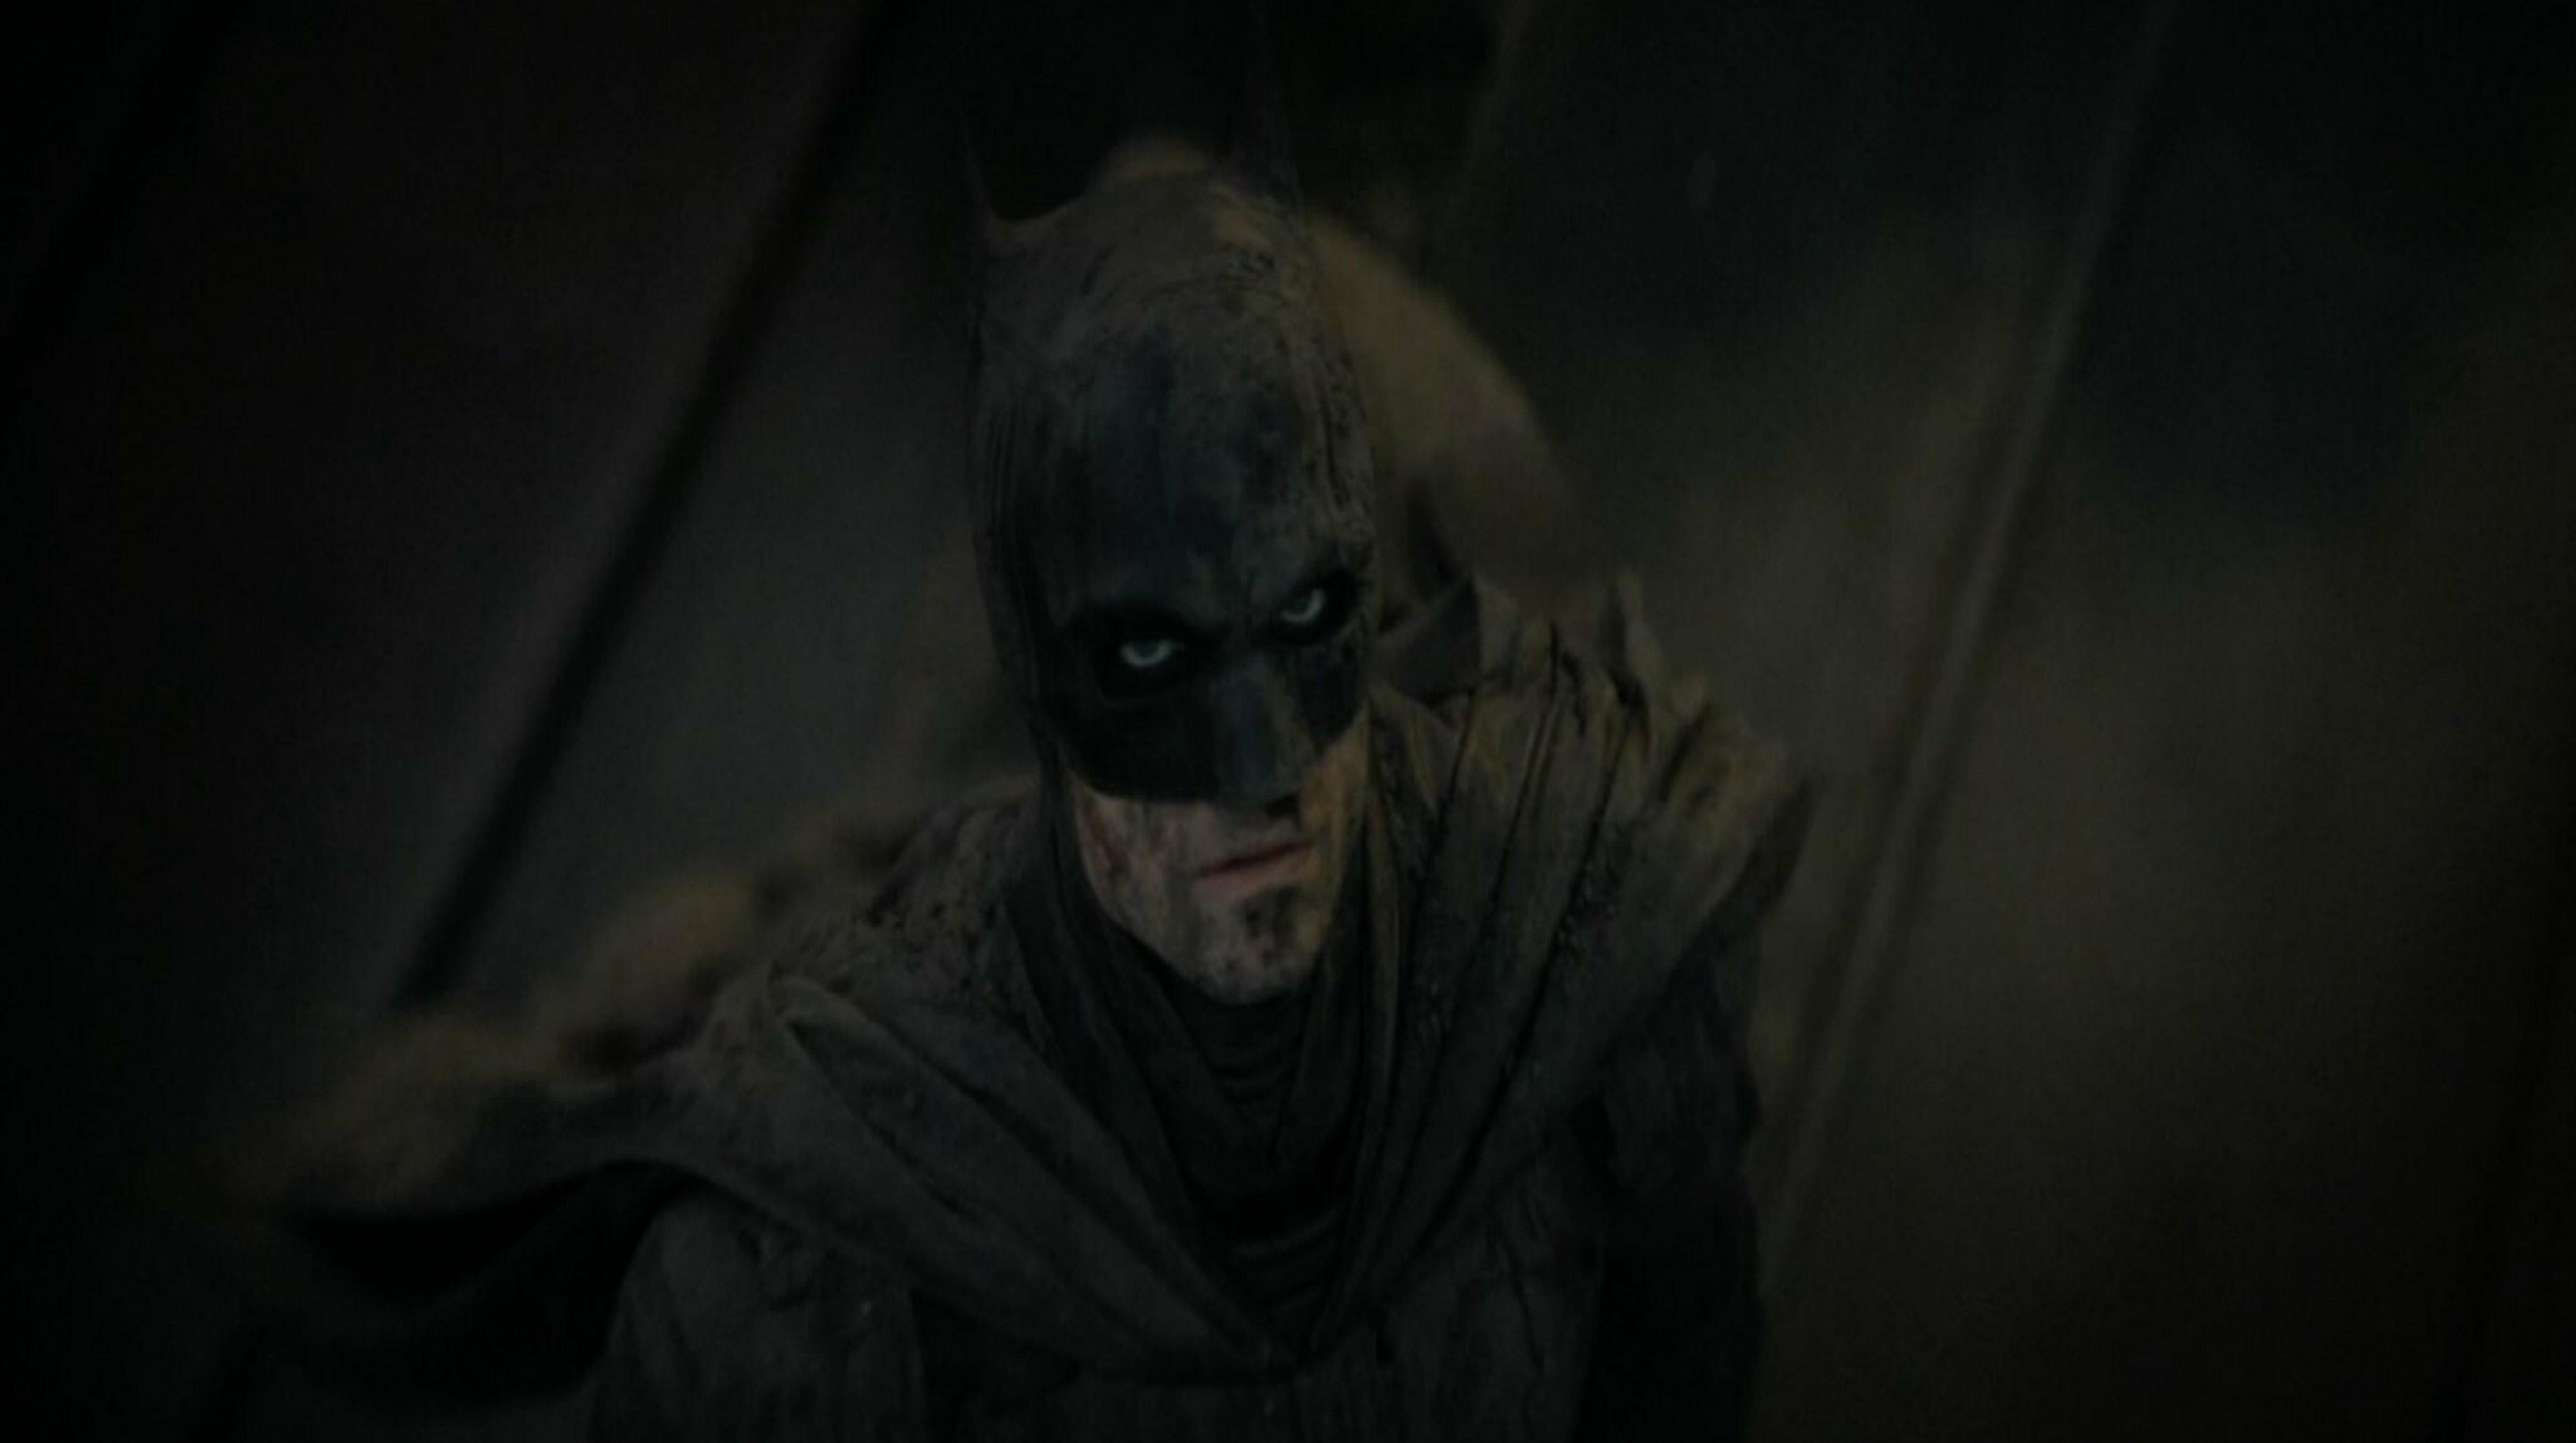 New Trailer For The Batman Debuts At DC FanDome